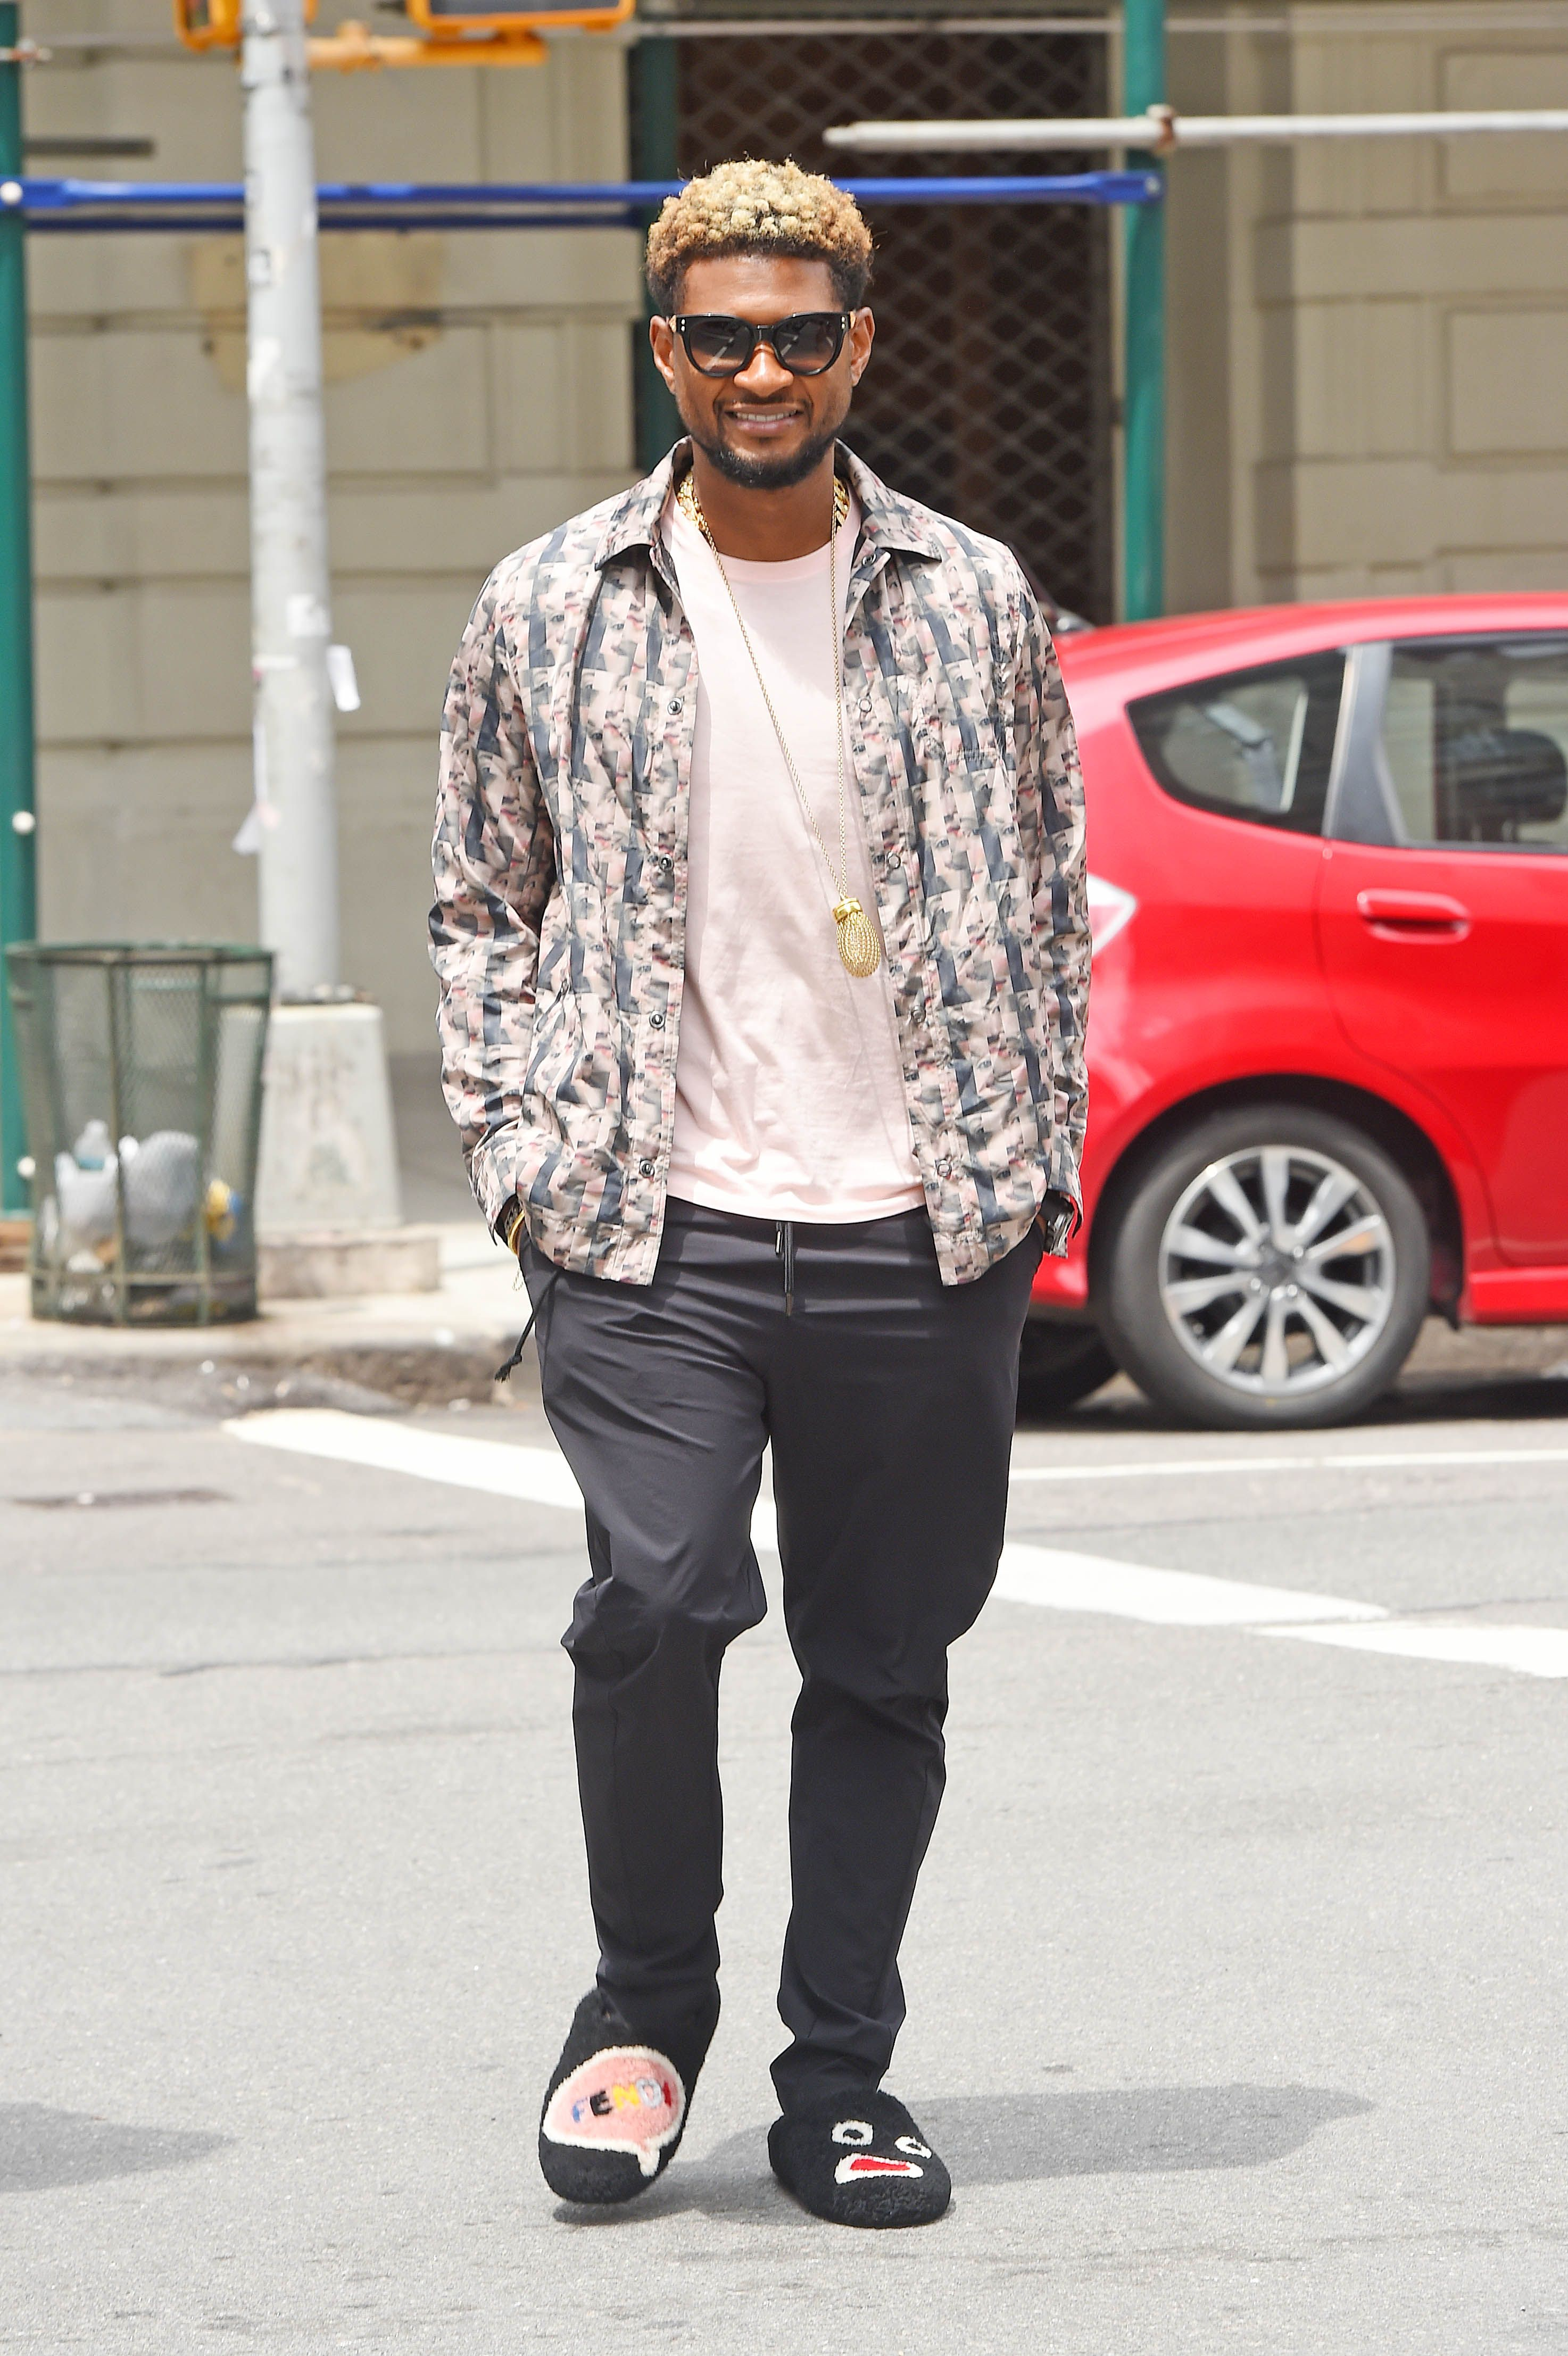 Celebrities Wearing House Slippers in